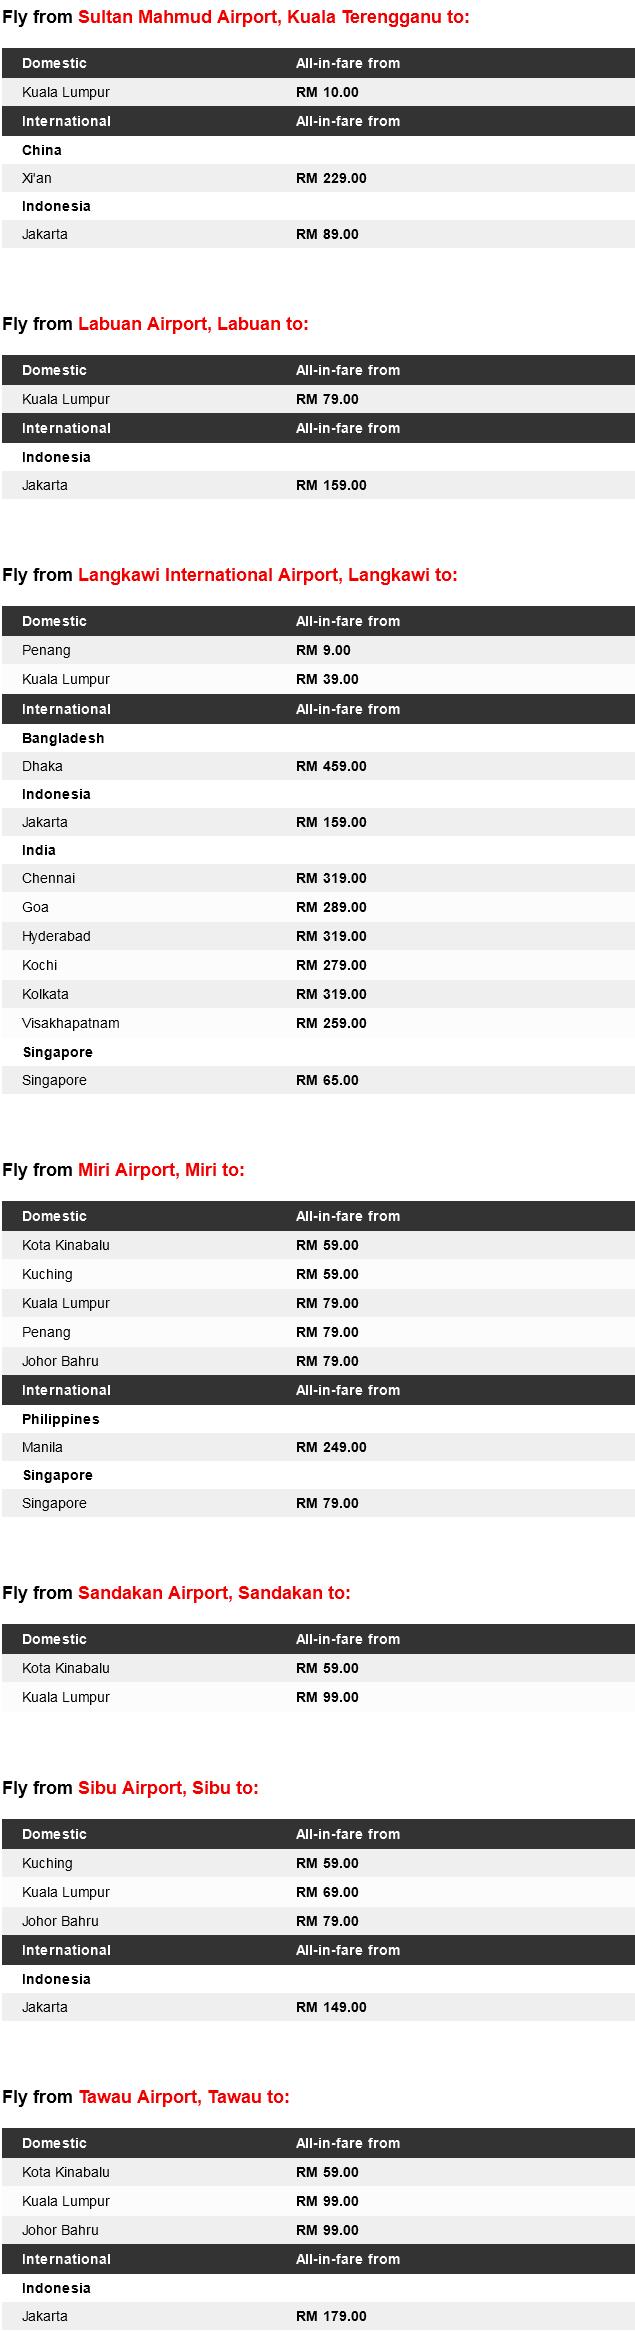 AirAsia RM0 Free Seats Promotion